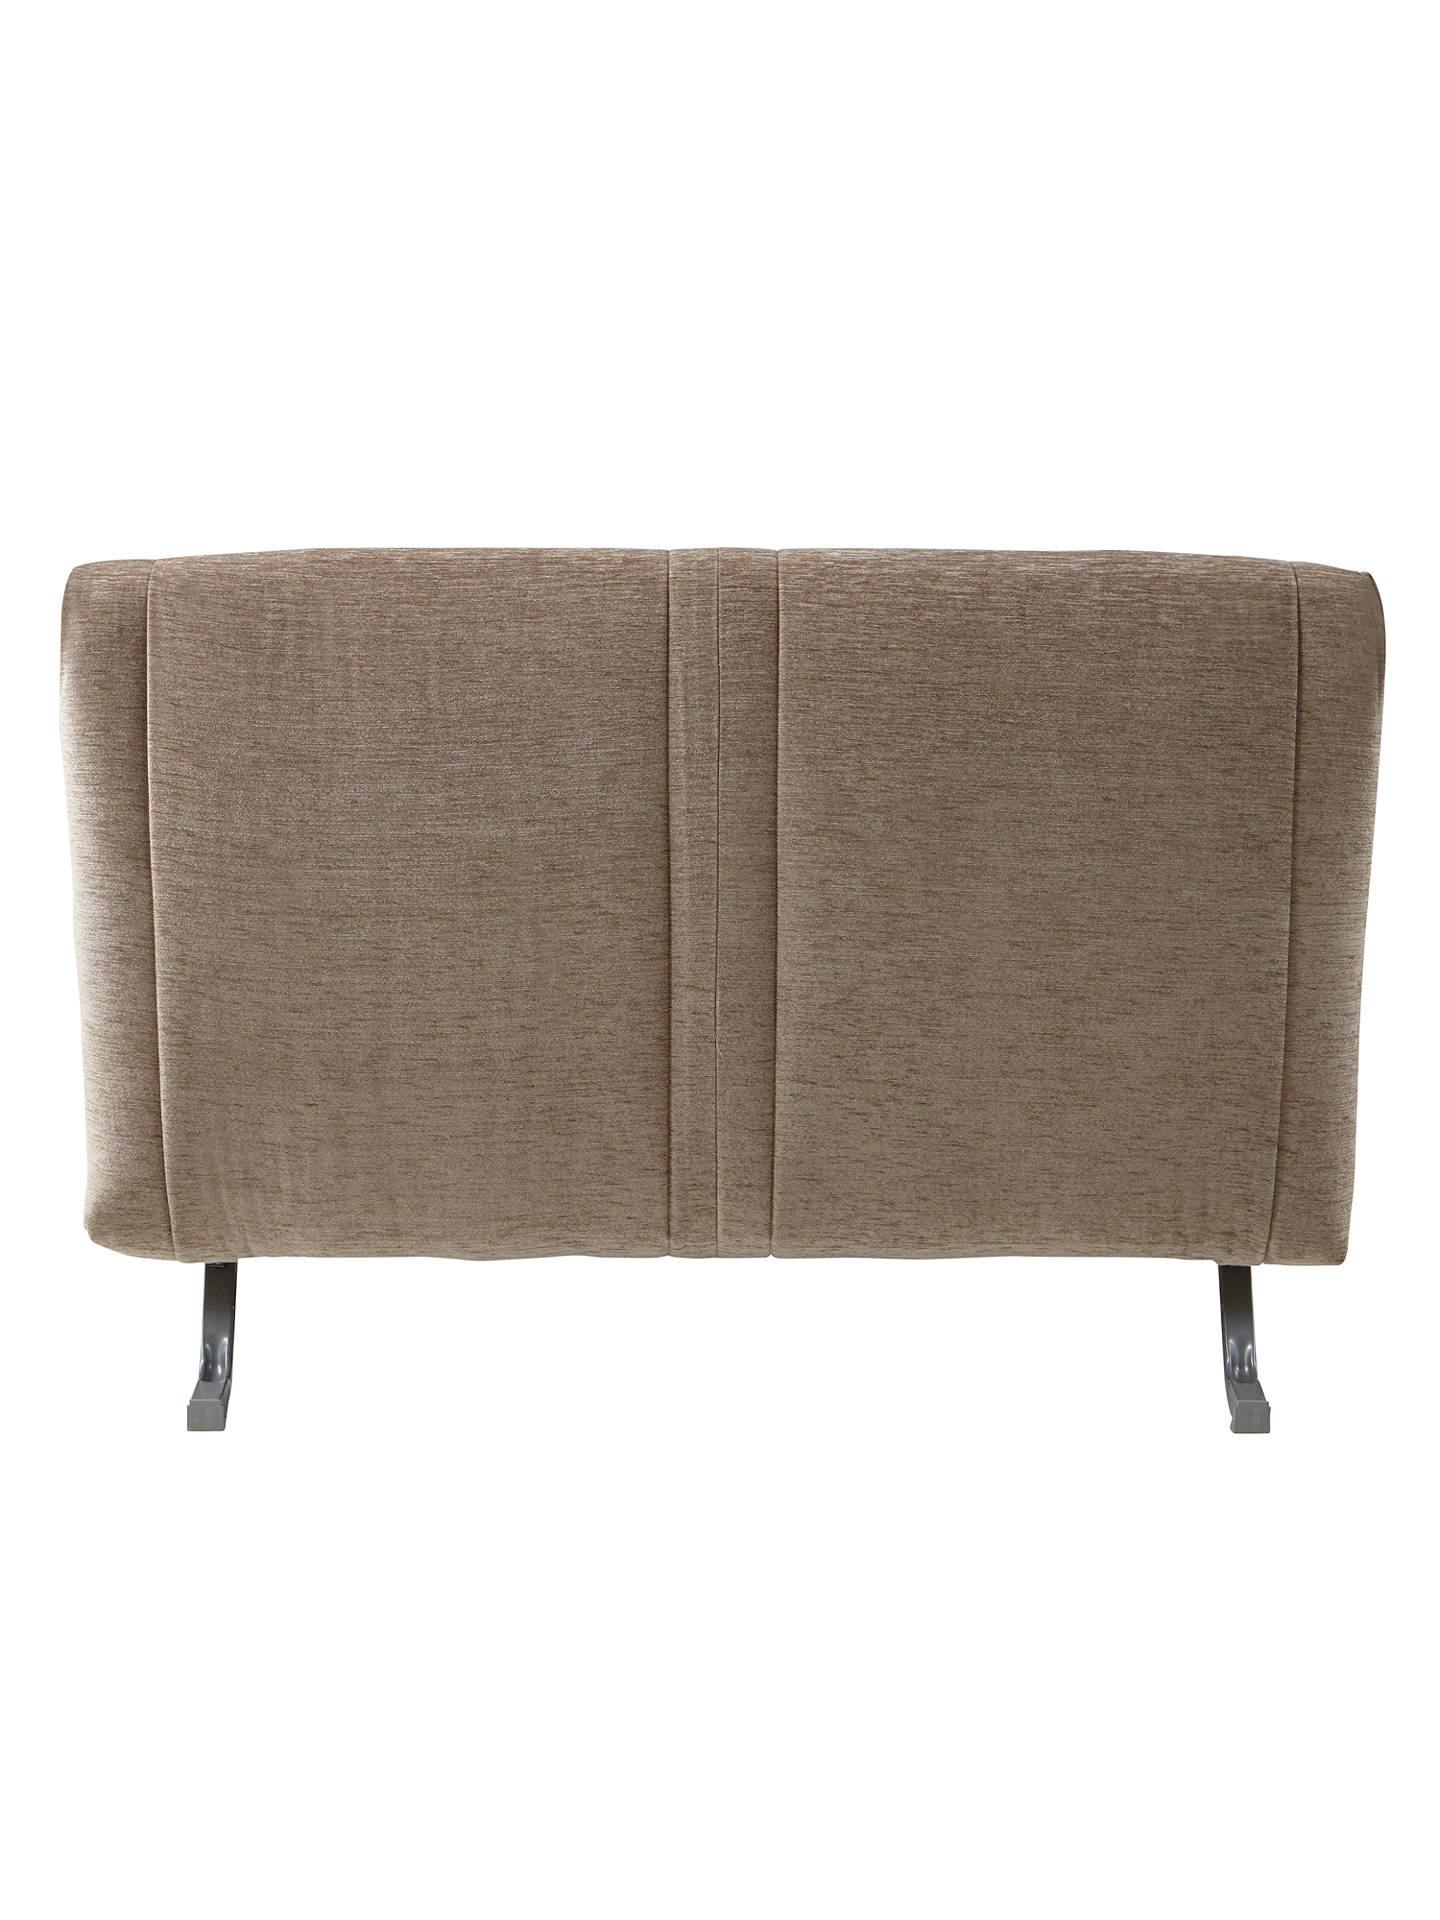 John Lewis Strauss Small Sofa Bed Rivoli Mocha At John